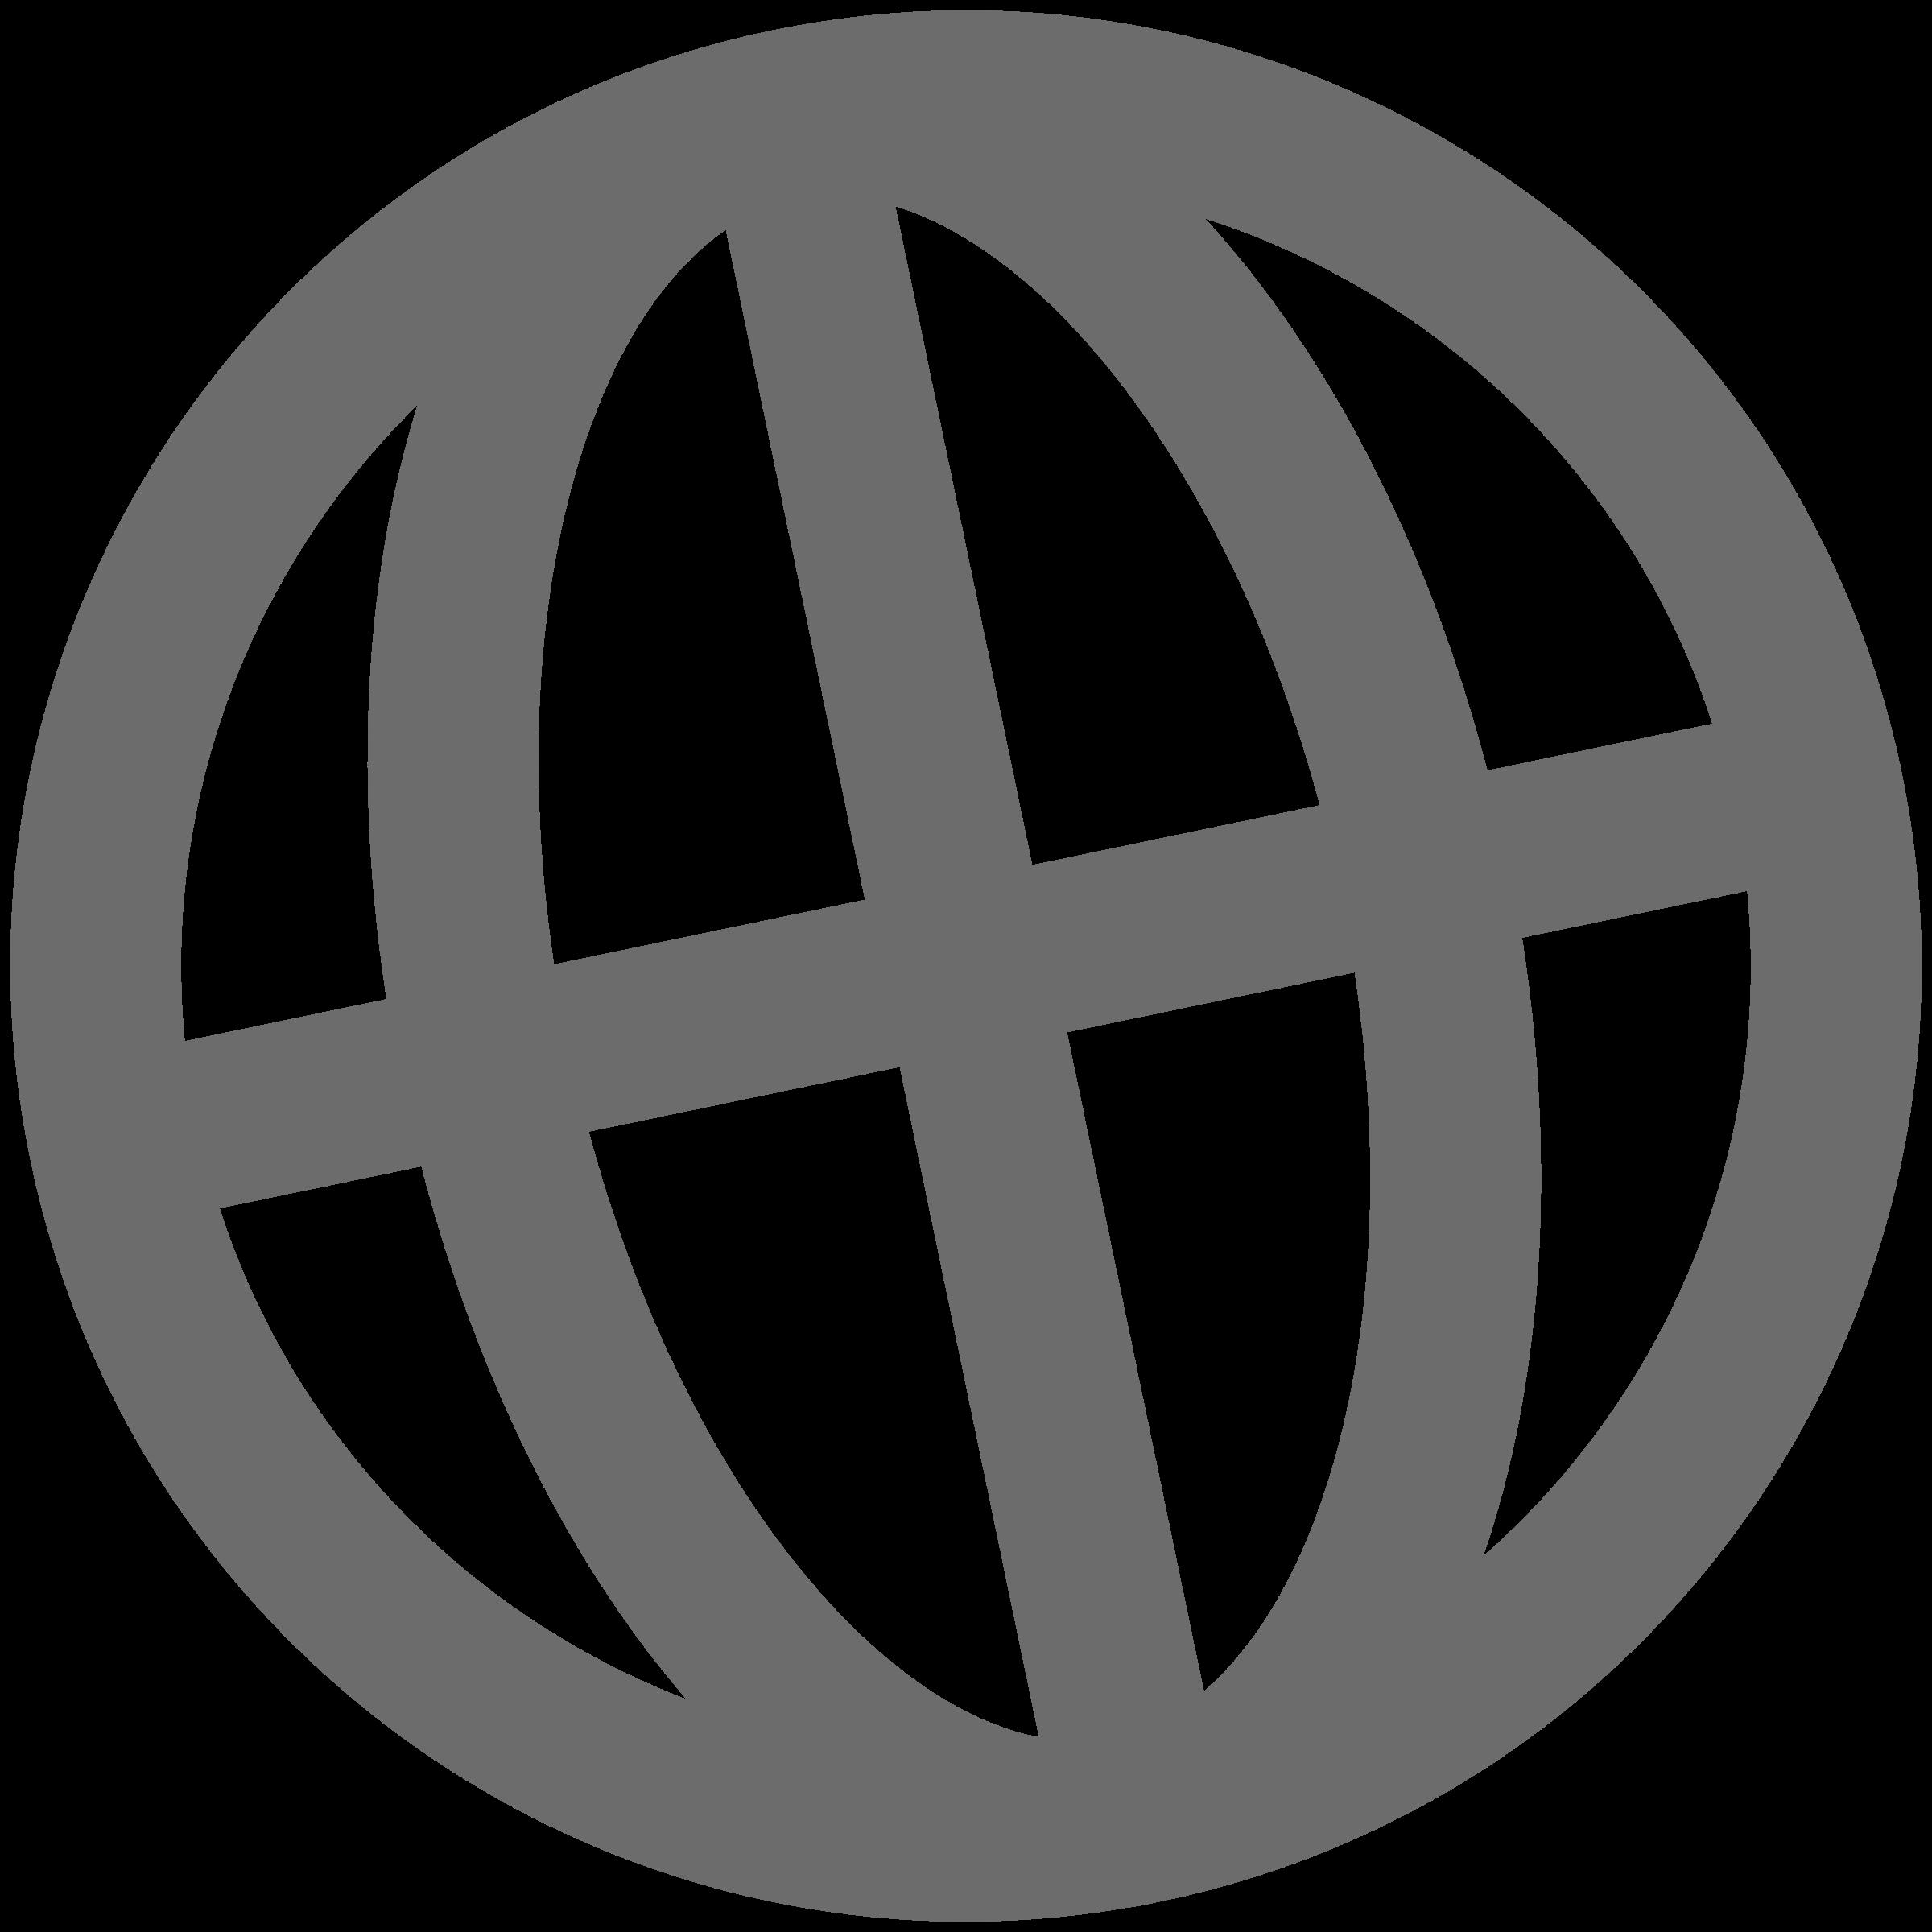 Electronics clipart internet symbol. Icon globe grey big